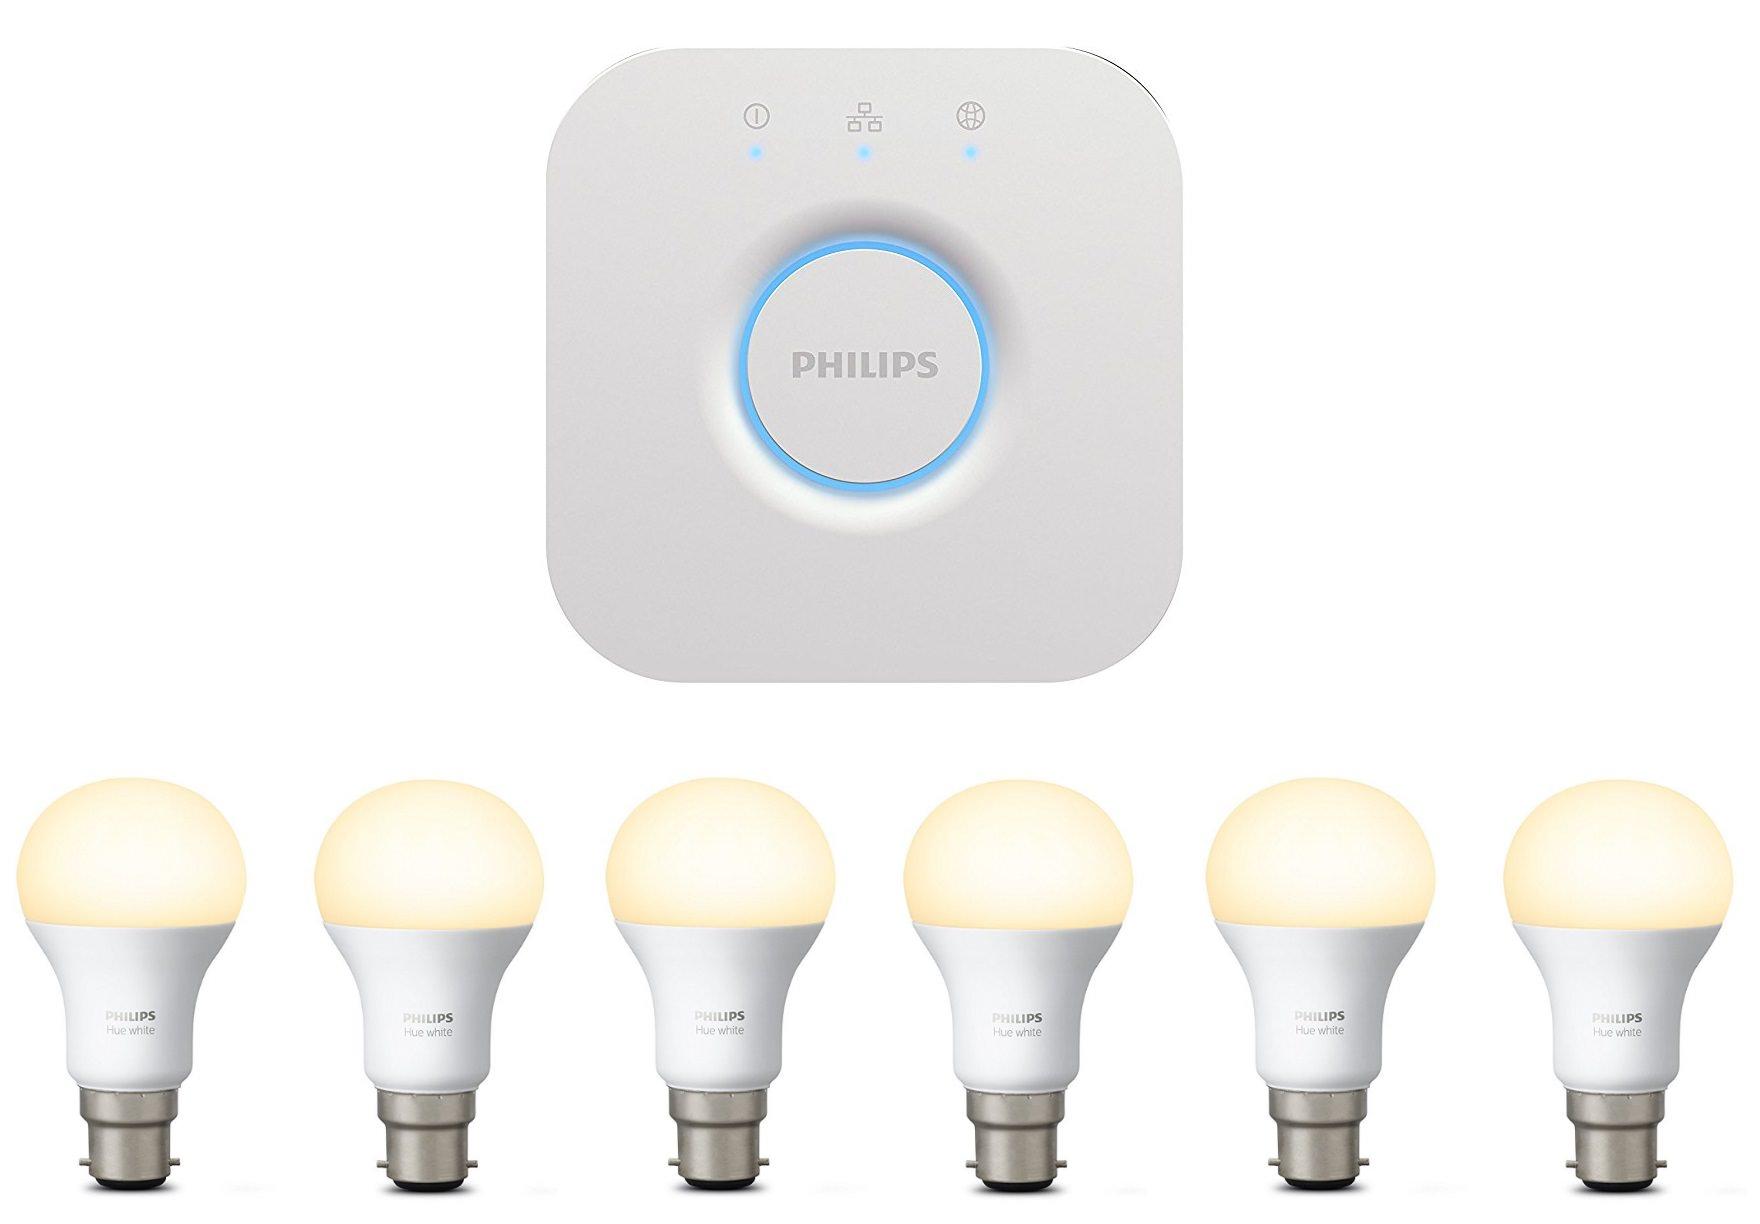 6 x Philips Hue Bulbs Philips Hue Personal Wireless